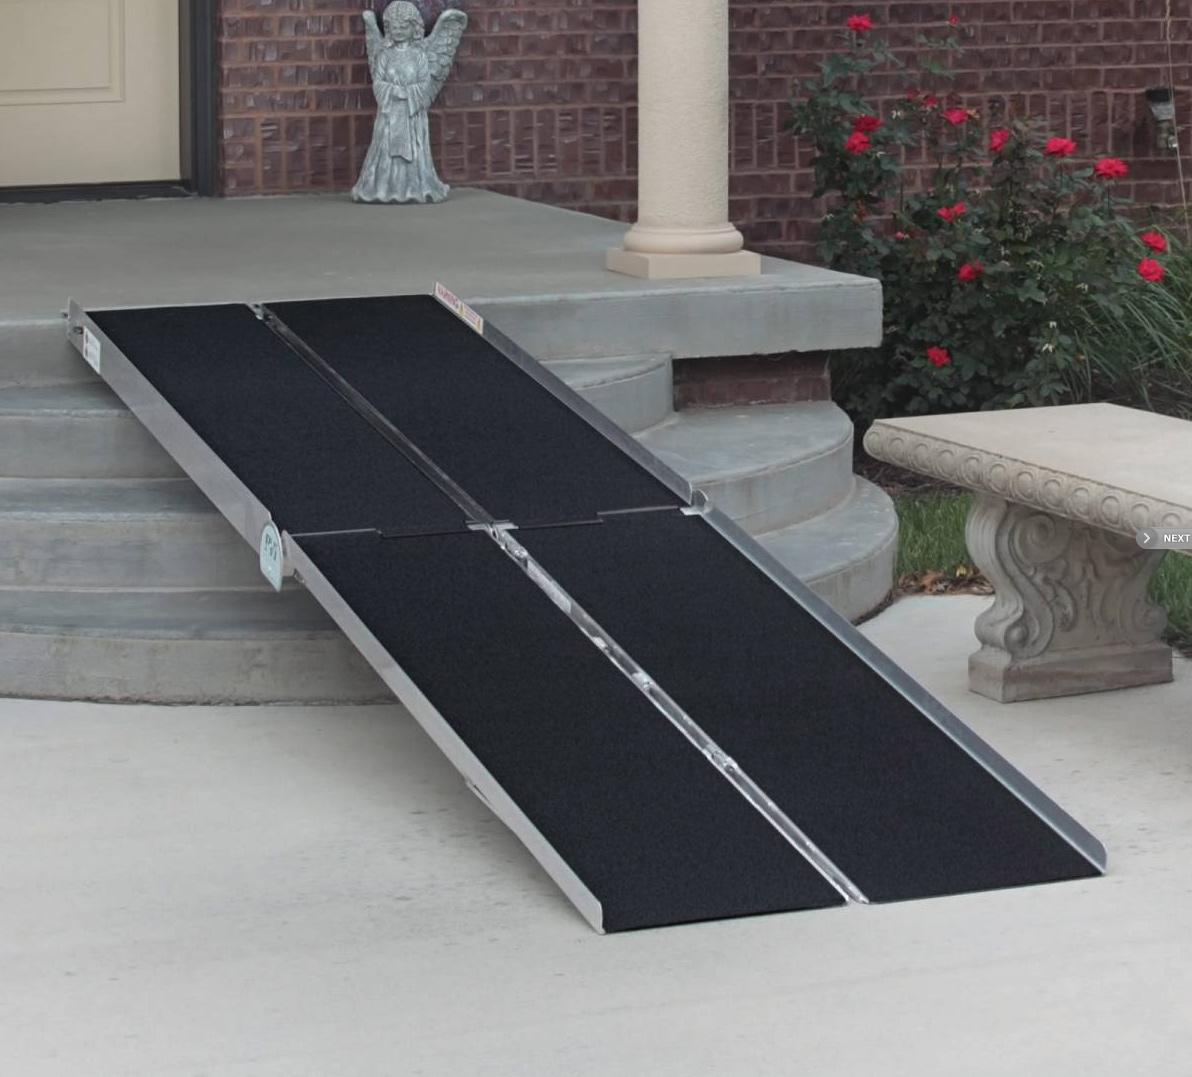 Skateboarding ramps